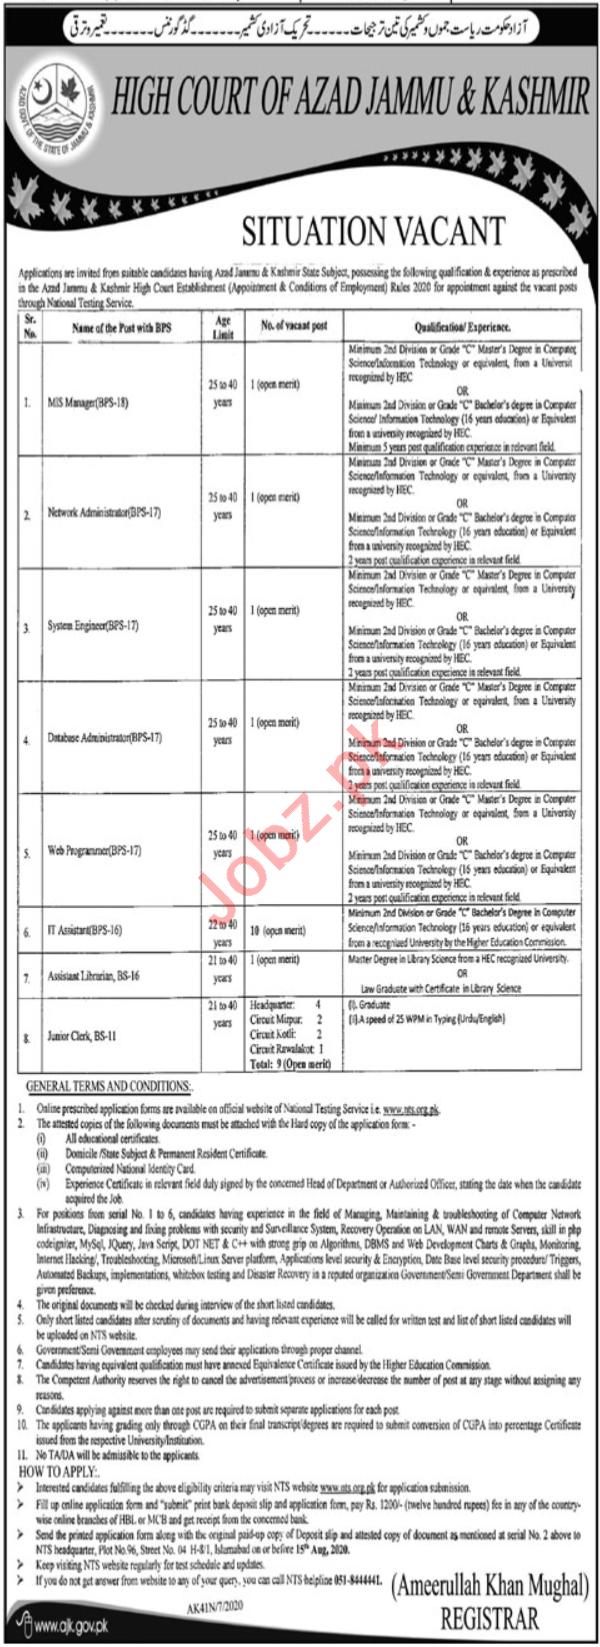 High Court of Azad Jammu & Kashmir Jobs 2020 for Managers